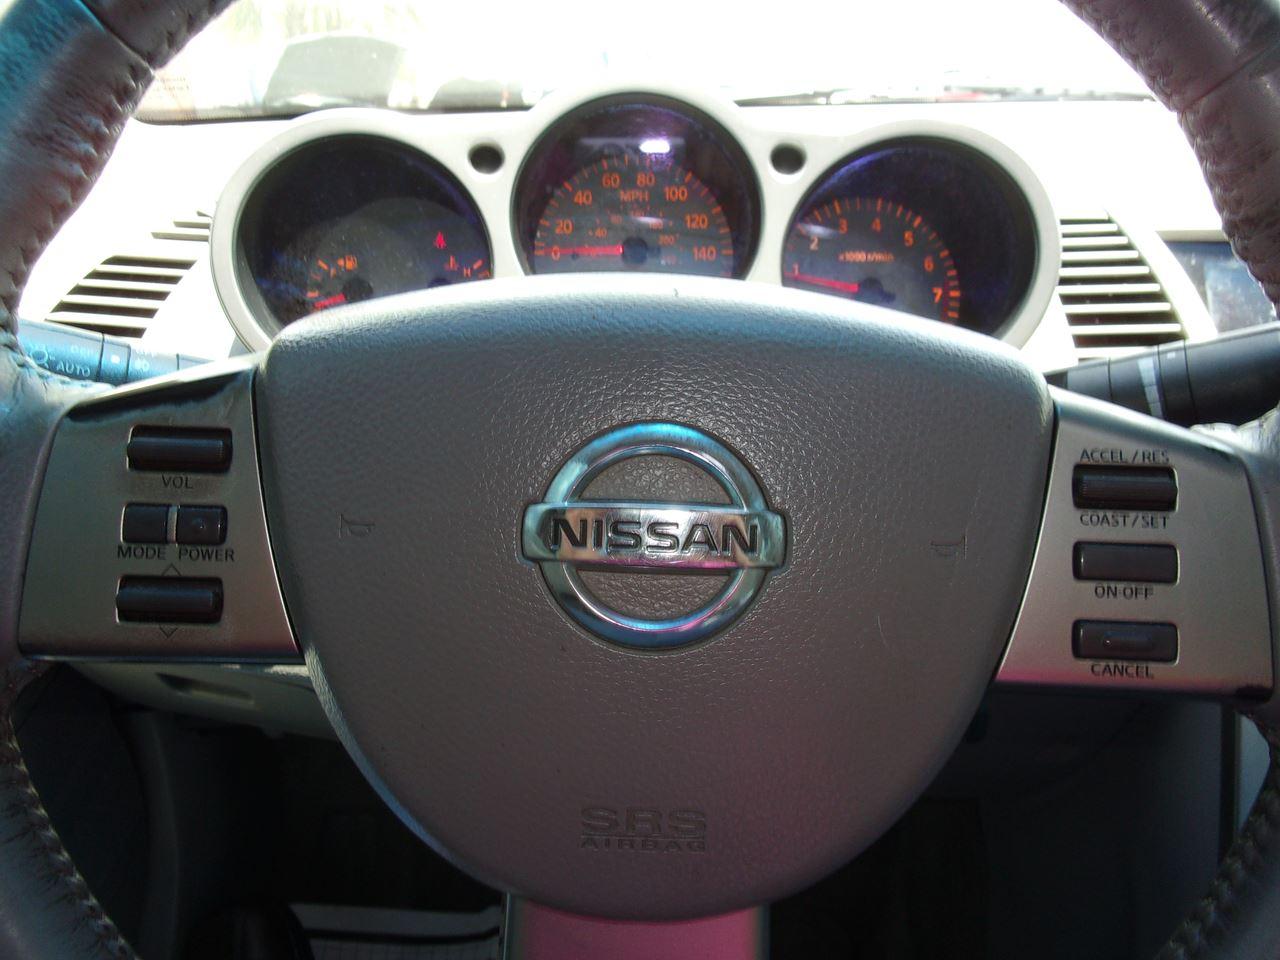 2004 nissan maxima 3.5 se in oviedo fl - carport s and leasing